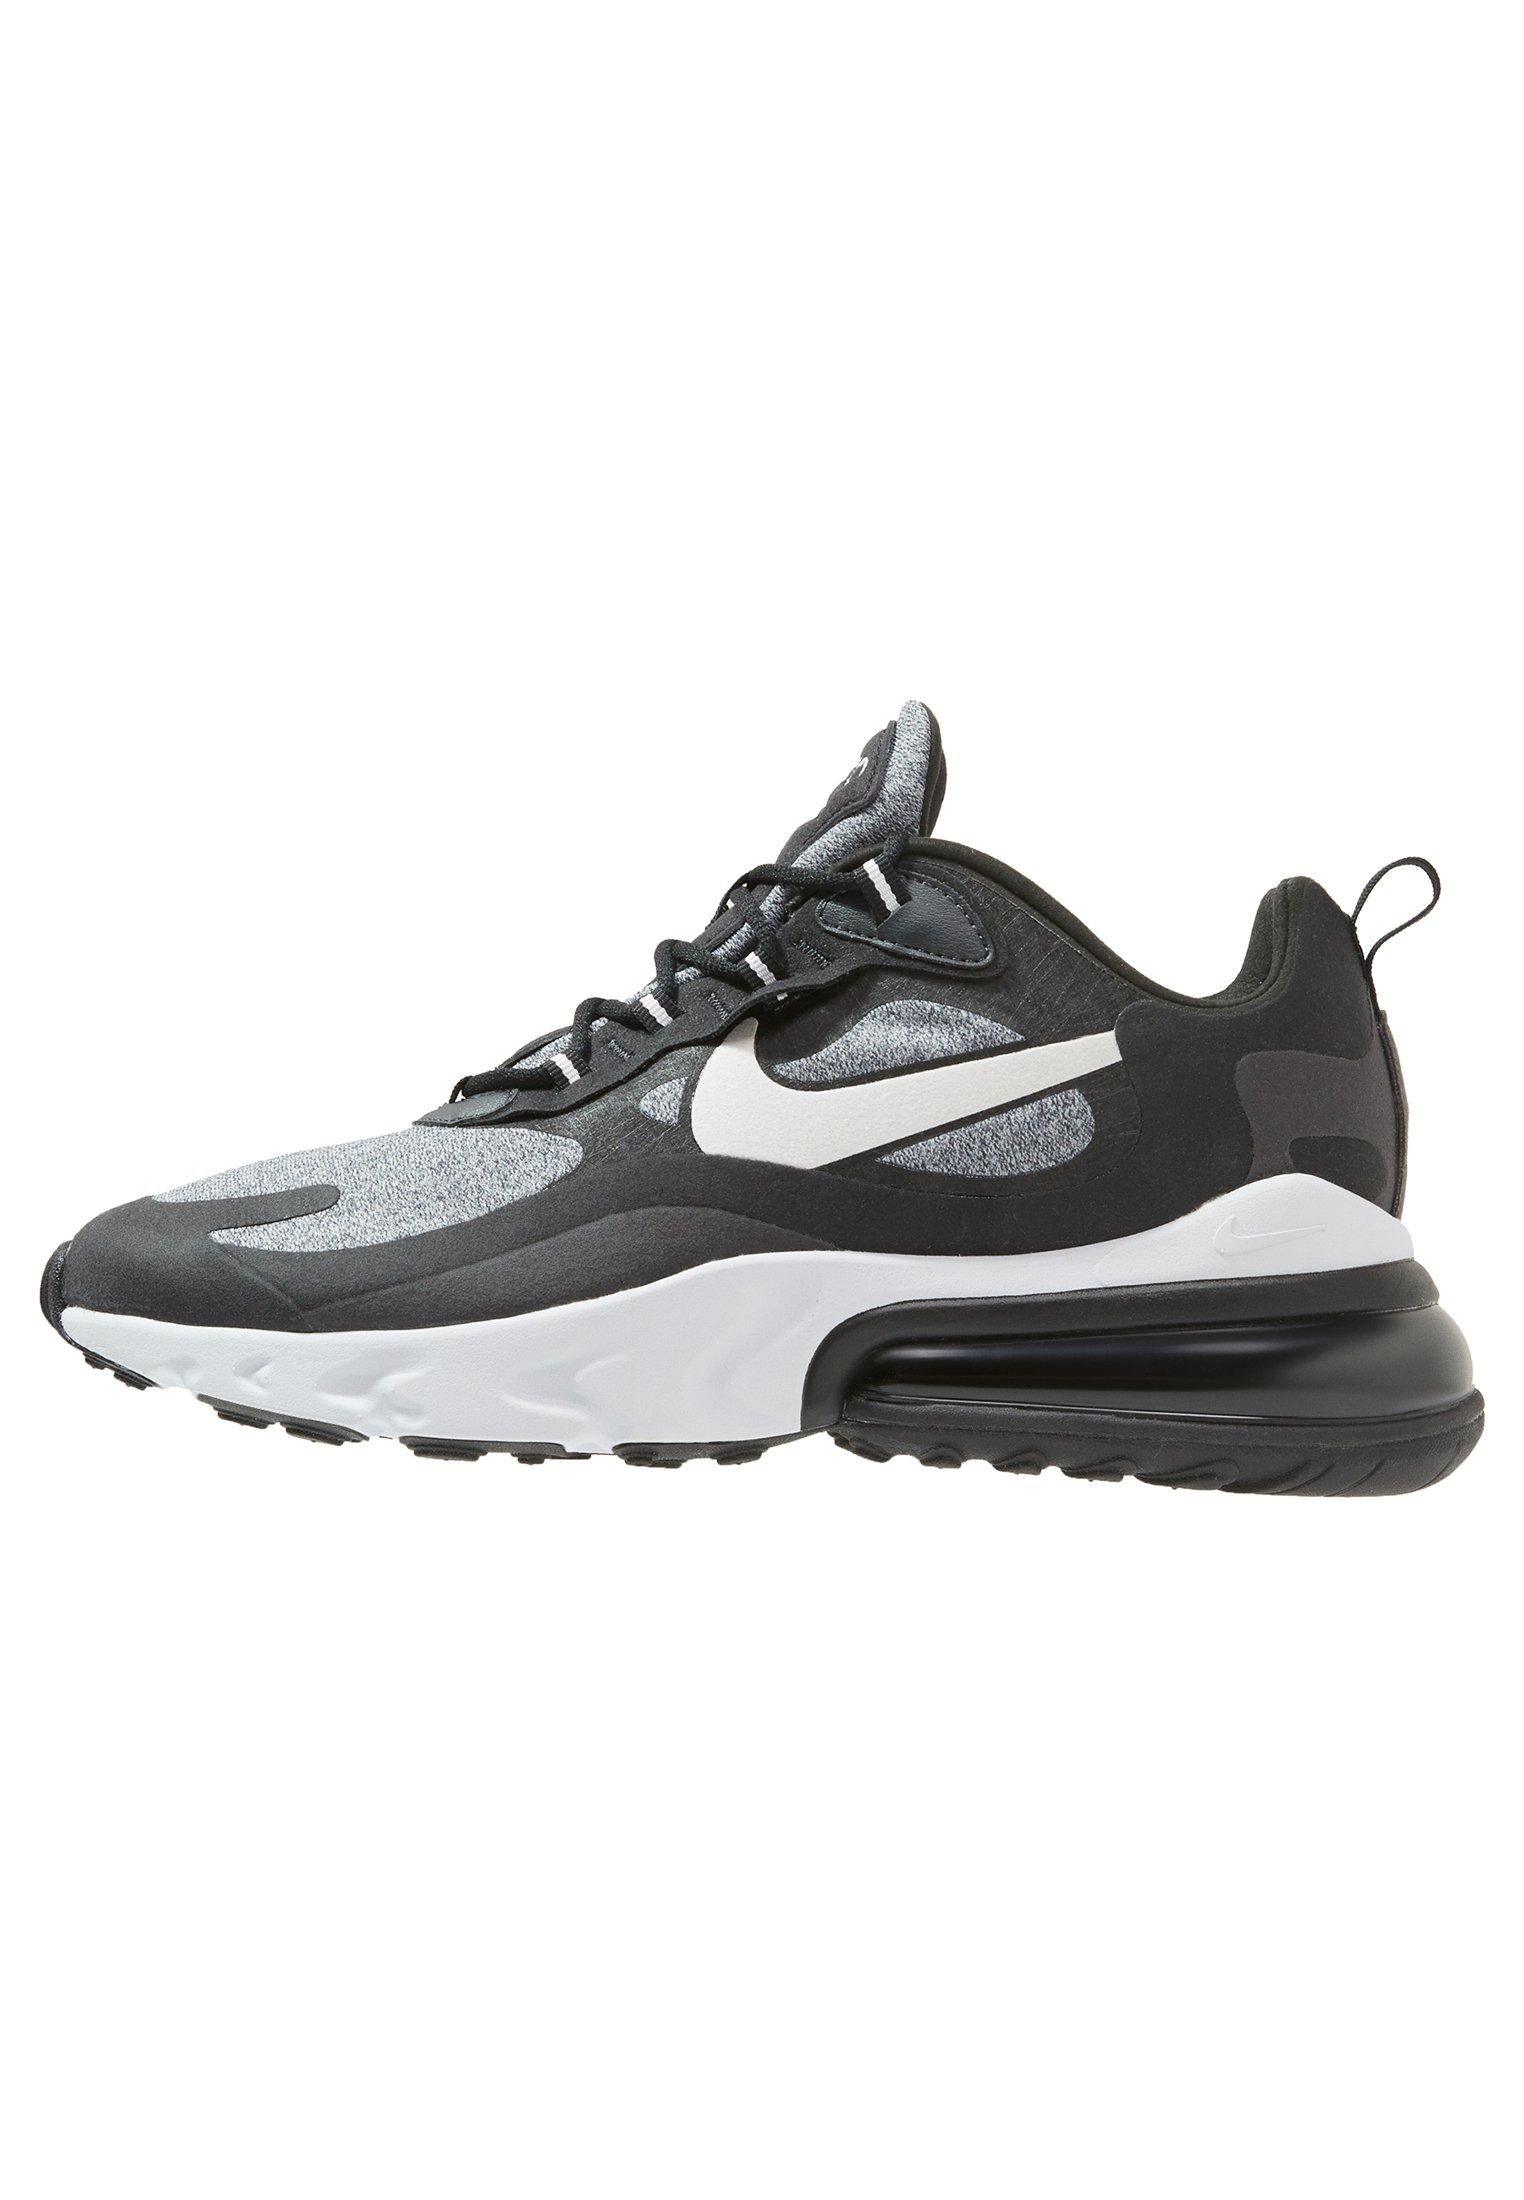 nike chaussure 270 react